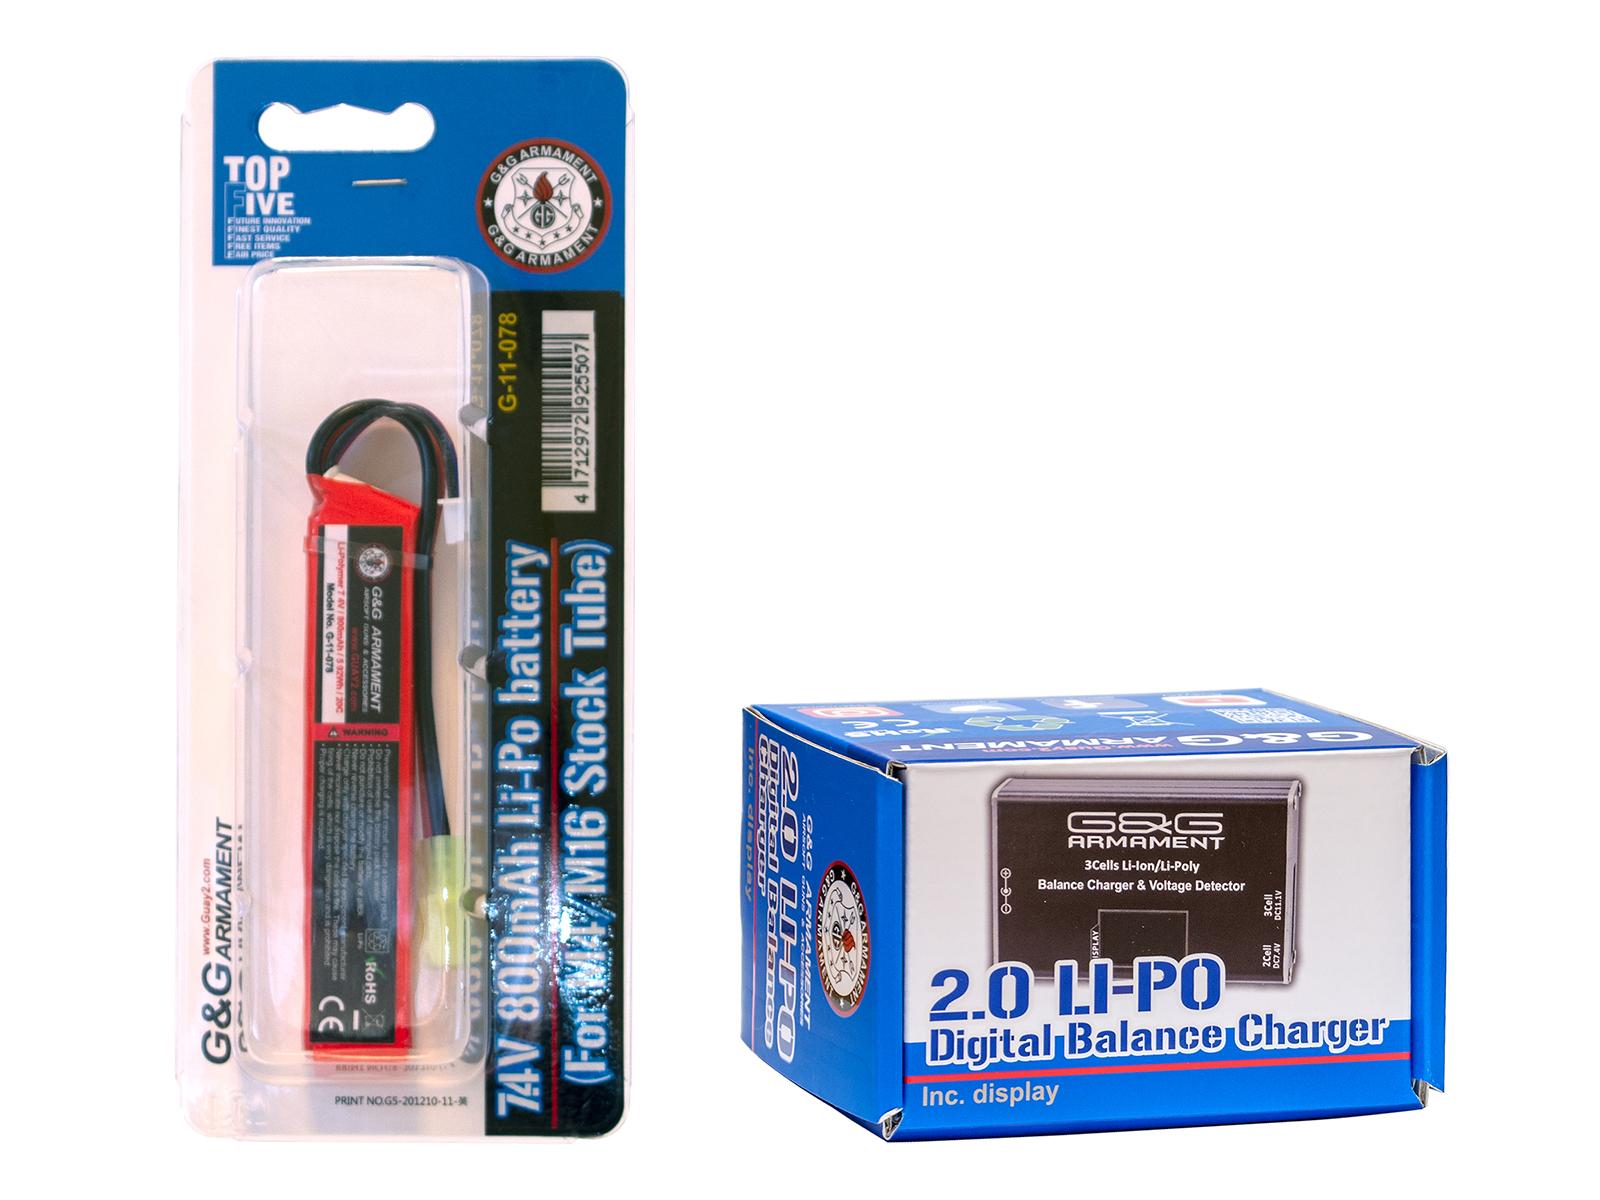 G&Gアーマメント 7.4V/800mAh/20C リポバッテリー(G-11-078)・リポバッテリー専用充電器(G-11-148)セット